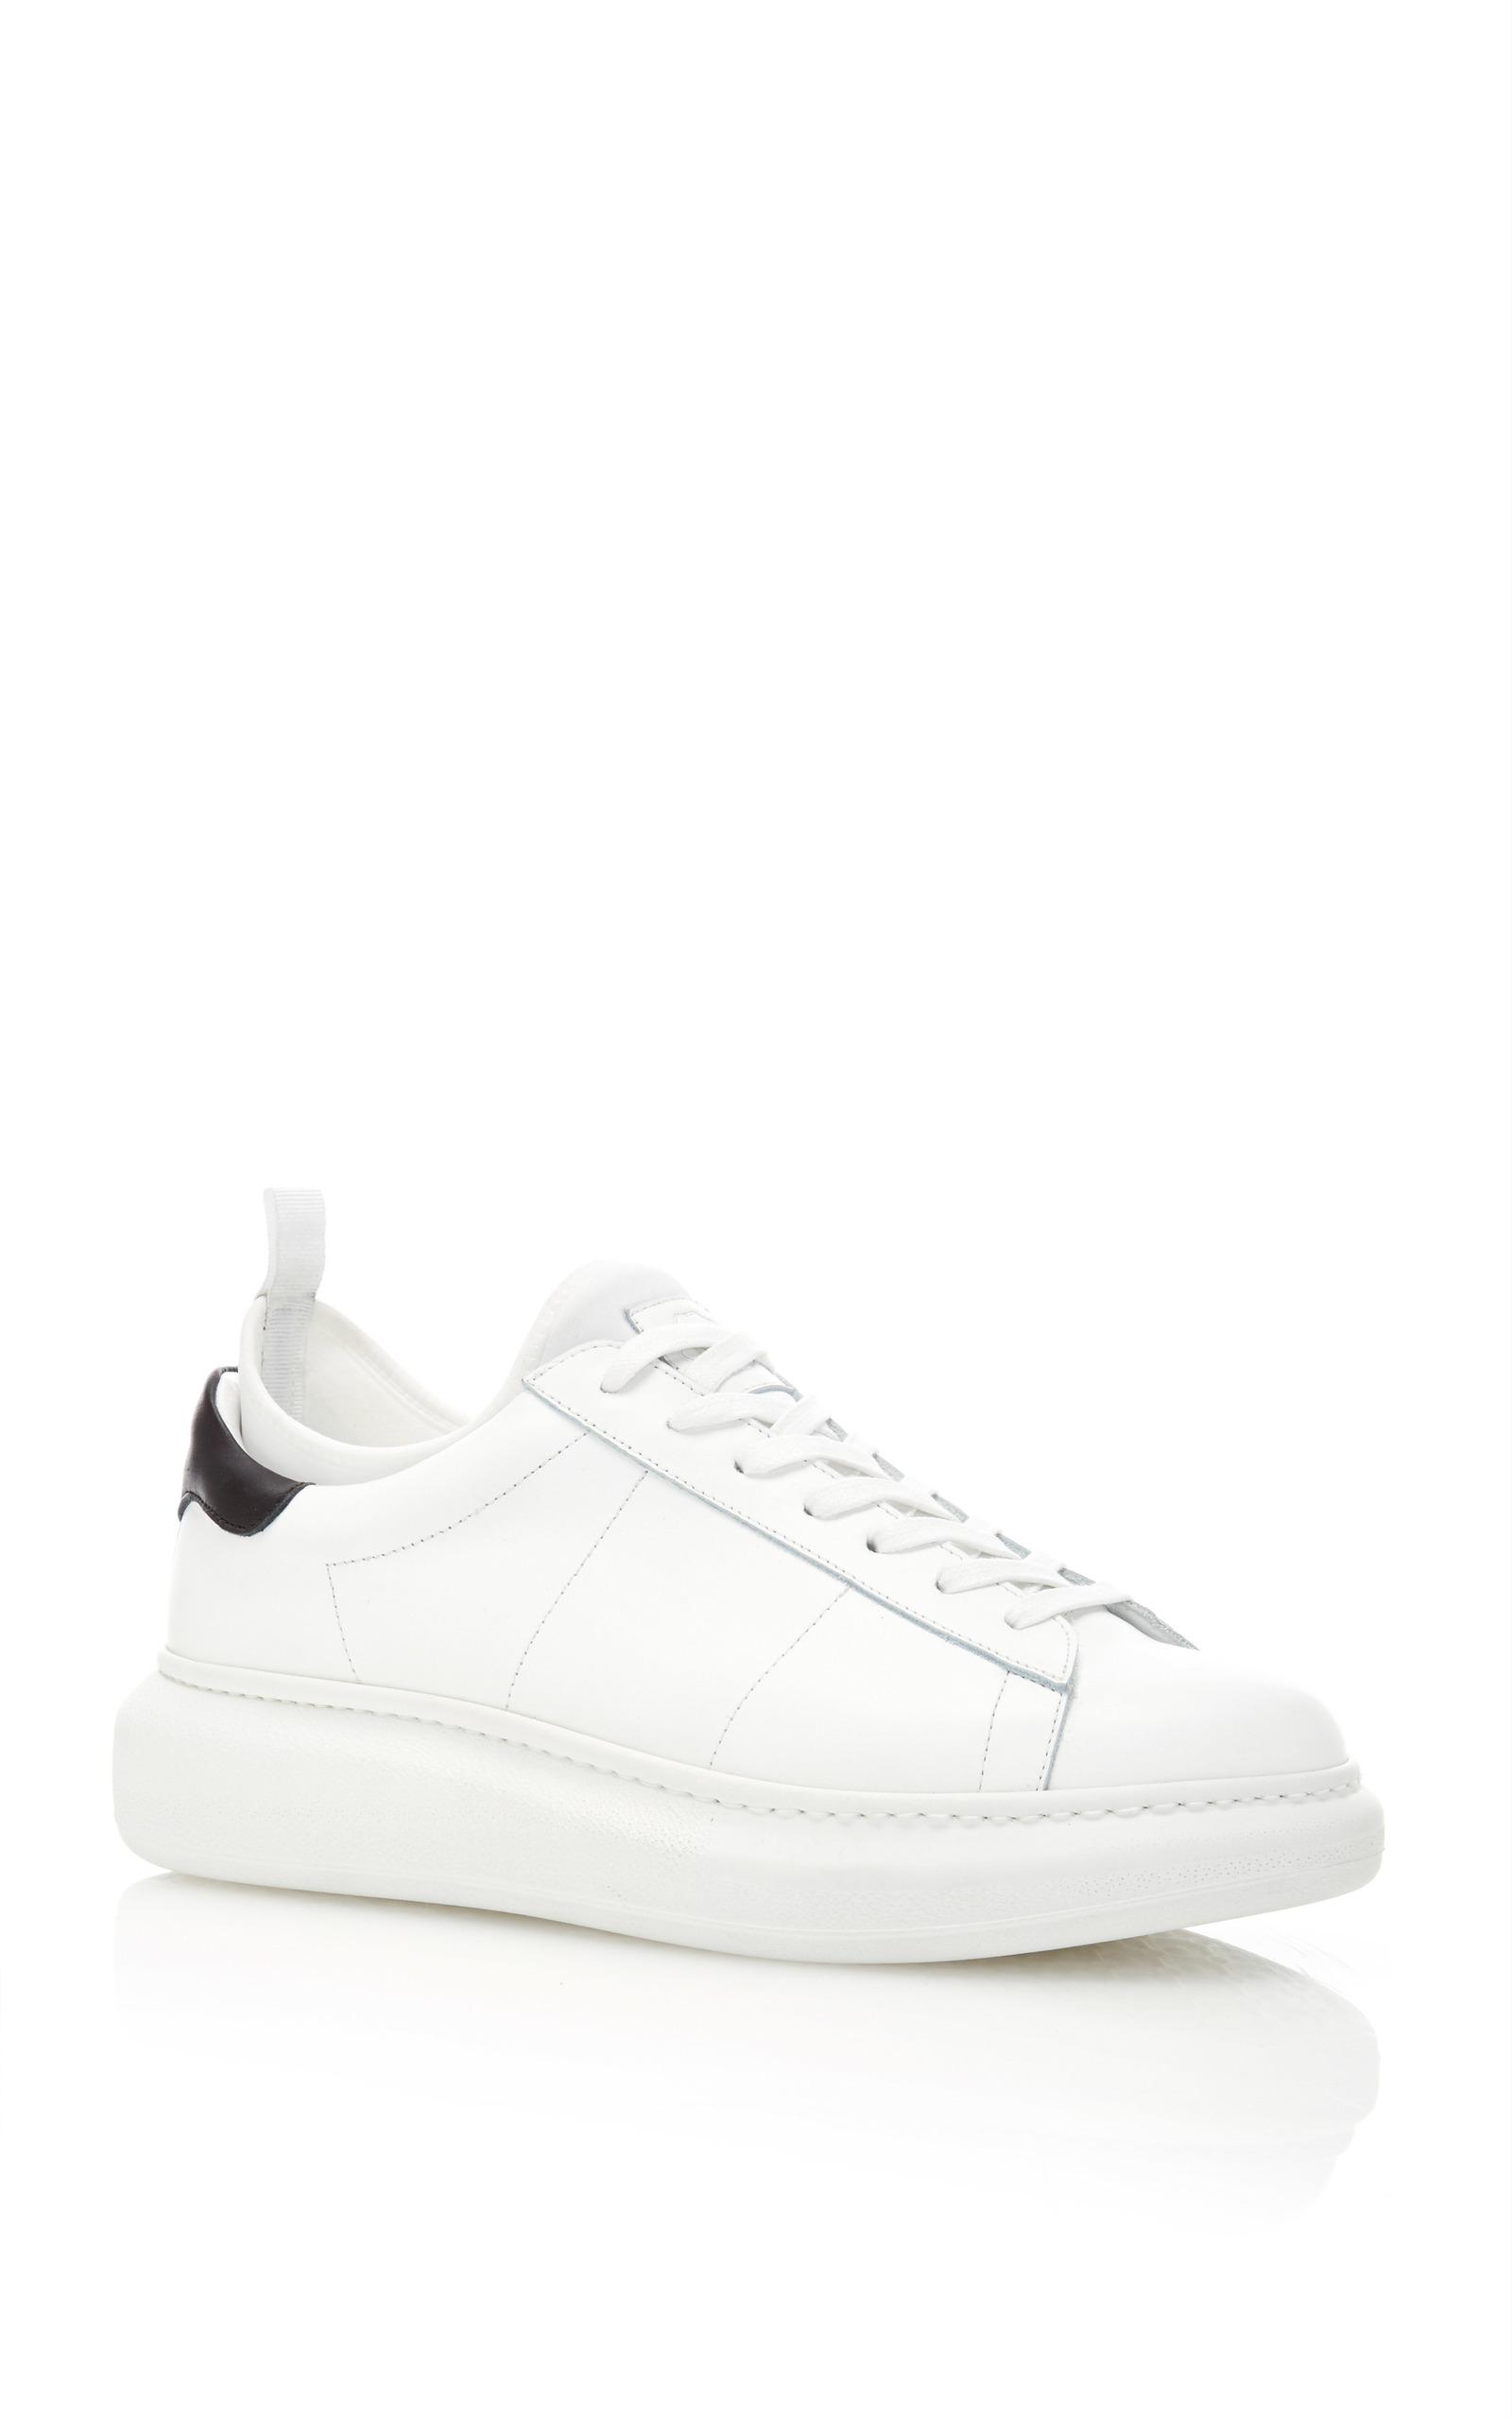 Alta ExclusiveThe ExclusiveThe Alta M'O Sneaker Sneaker M'O QBoshrtdCx